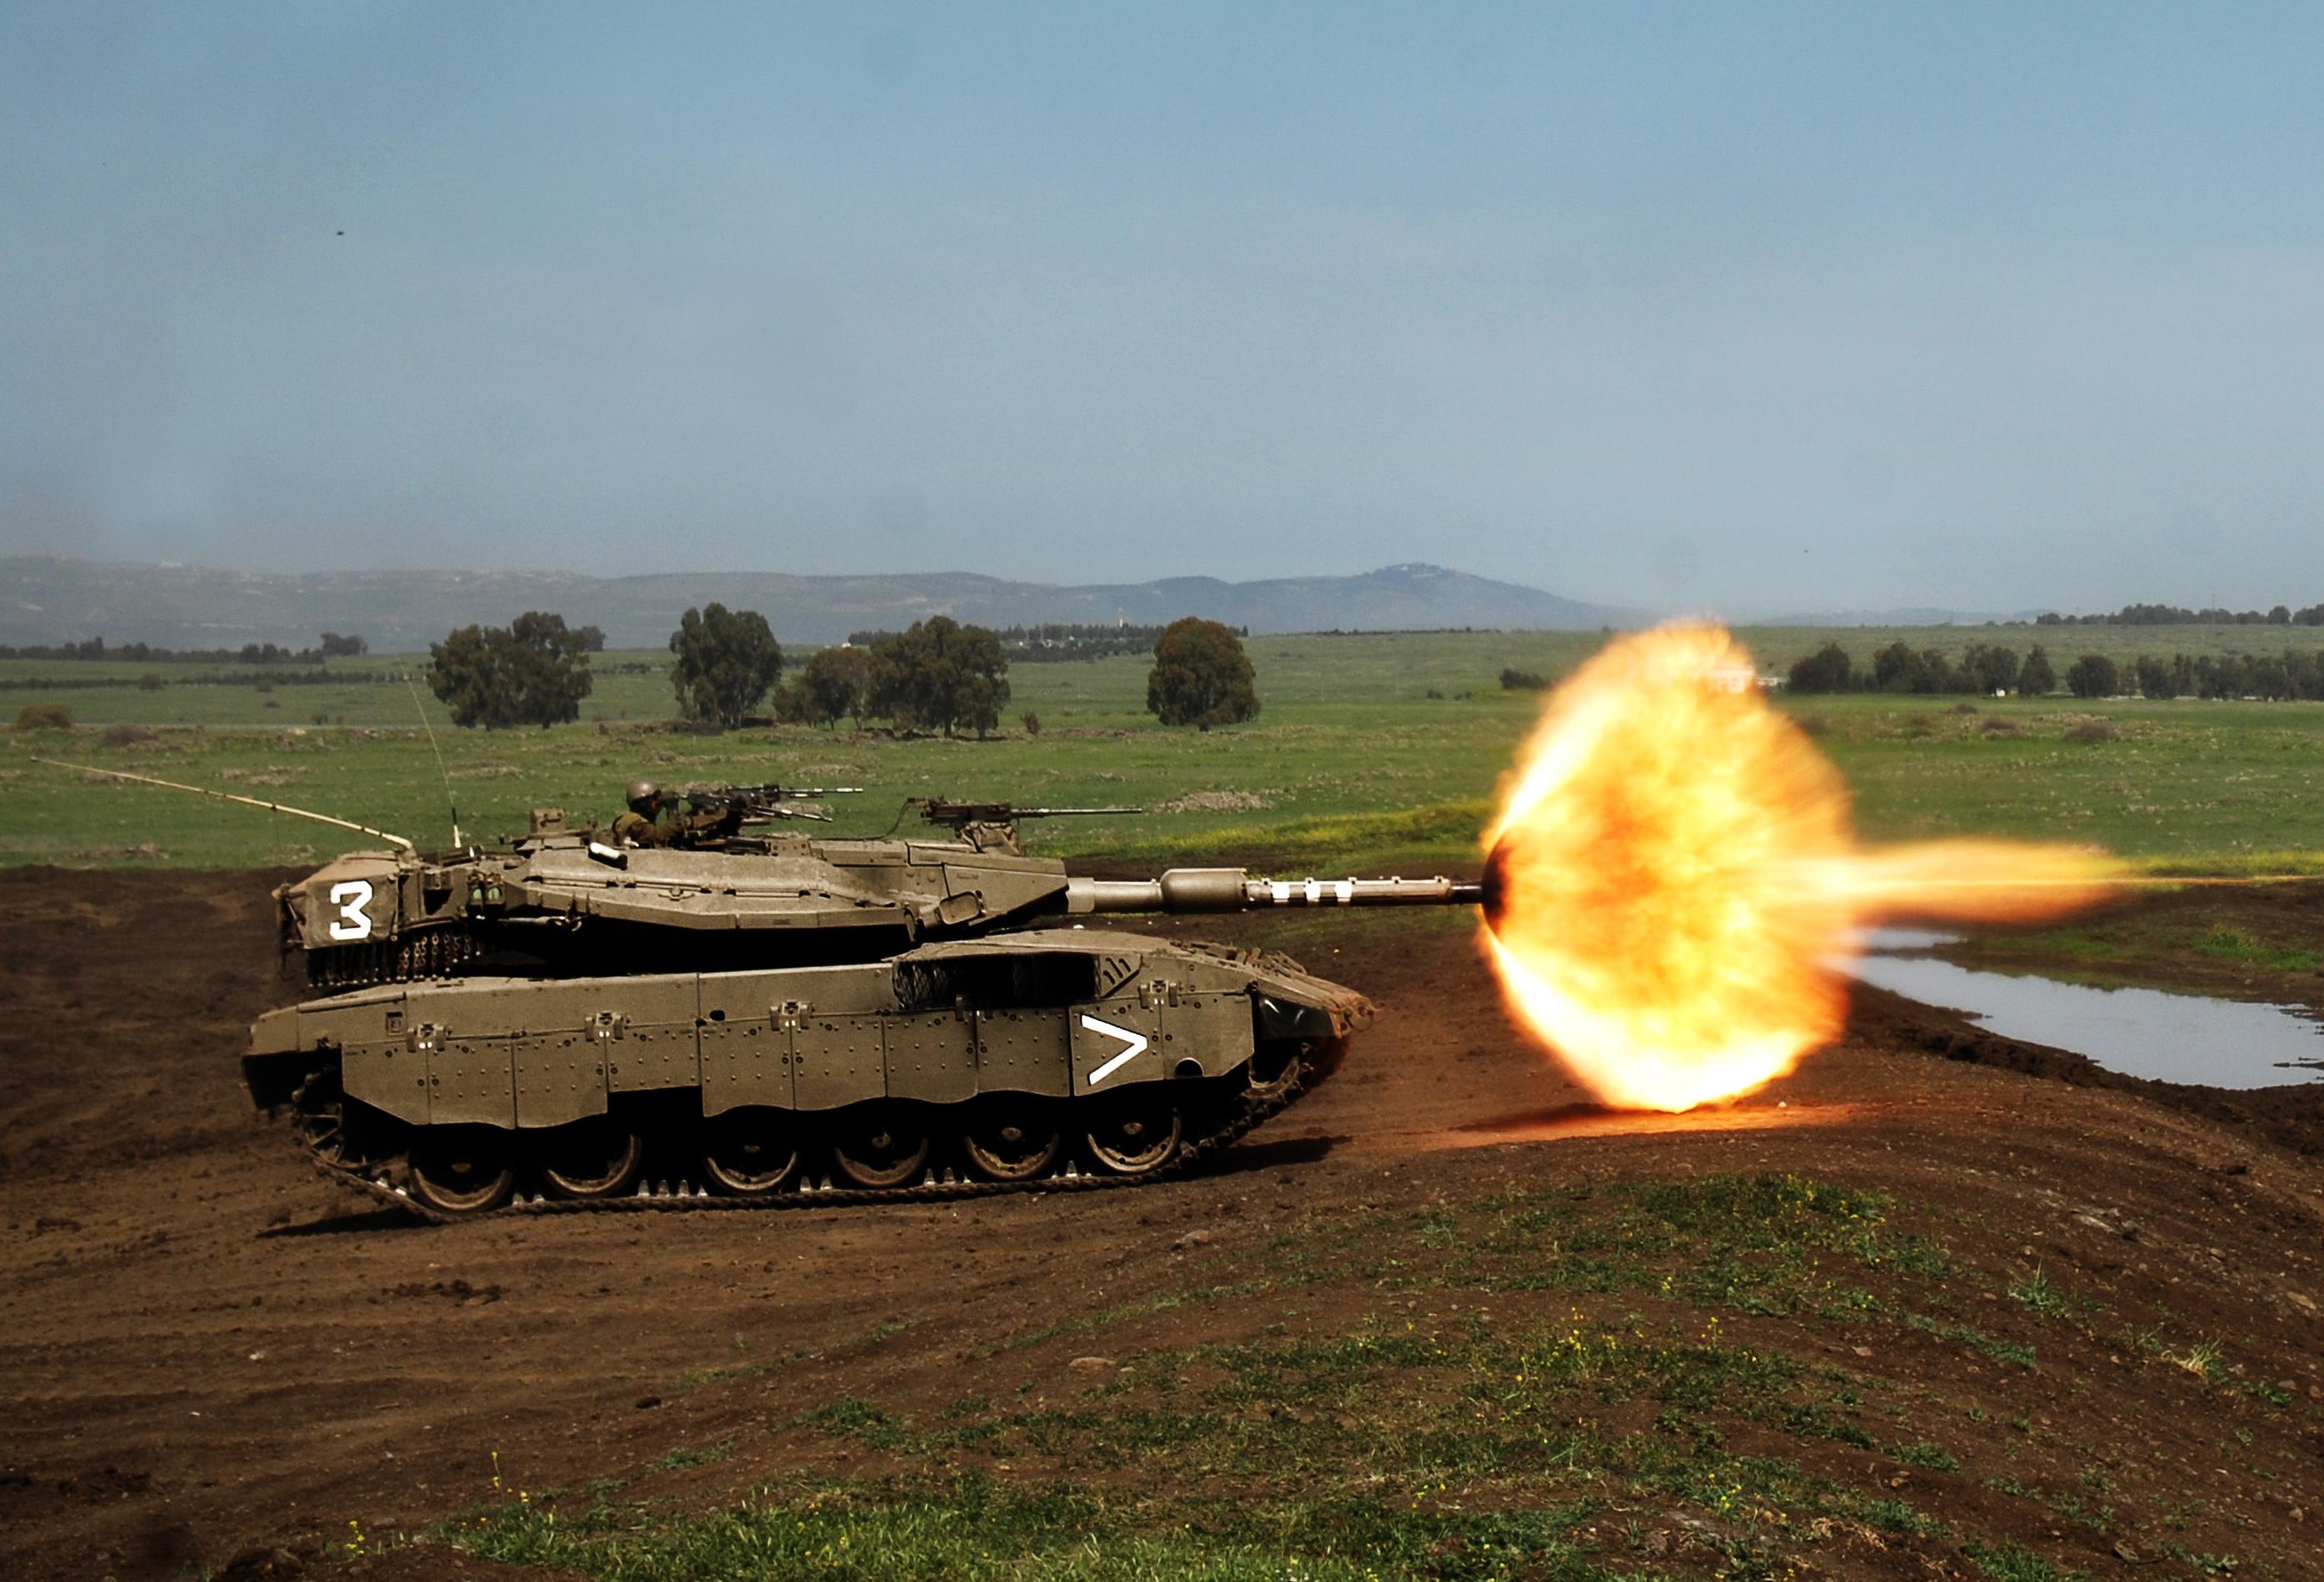 Armée Israélienne / Israel Defense Forces (IDF) - Page 4 IDF-Merkava-firing-Flickr_-_Israel_Defense_Forces_-_188th_Brigade_Training_Day_March_2008-cropped